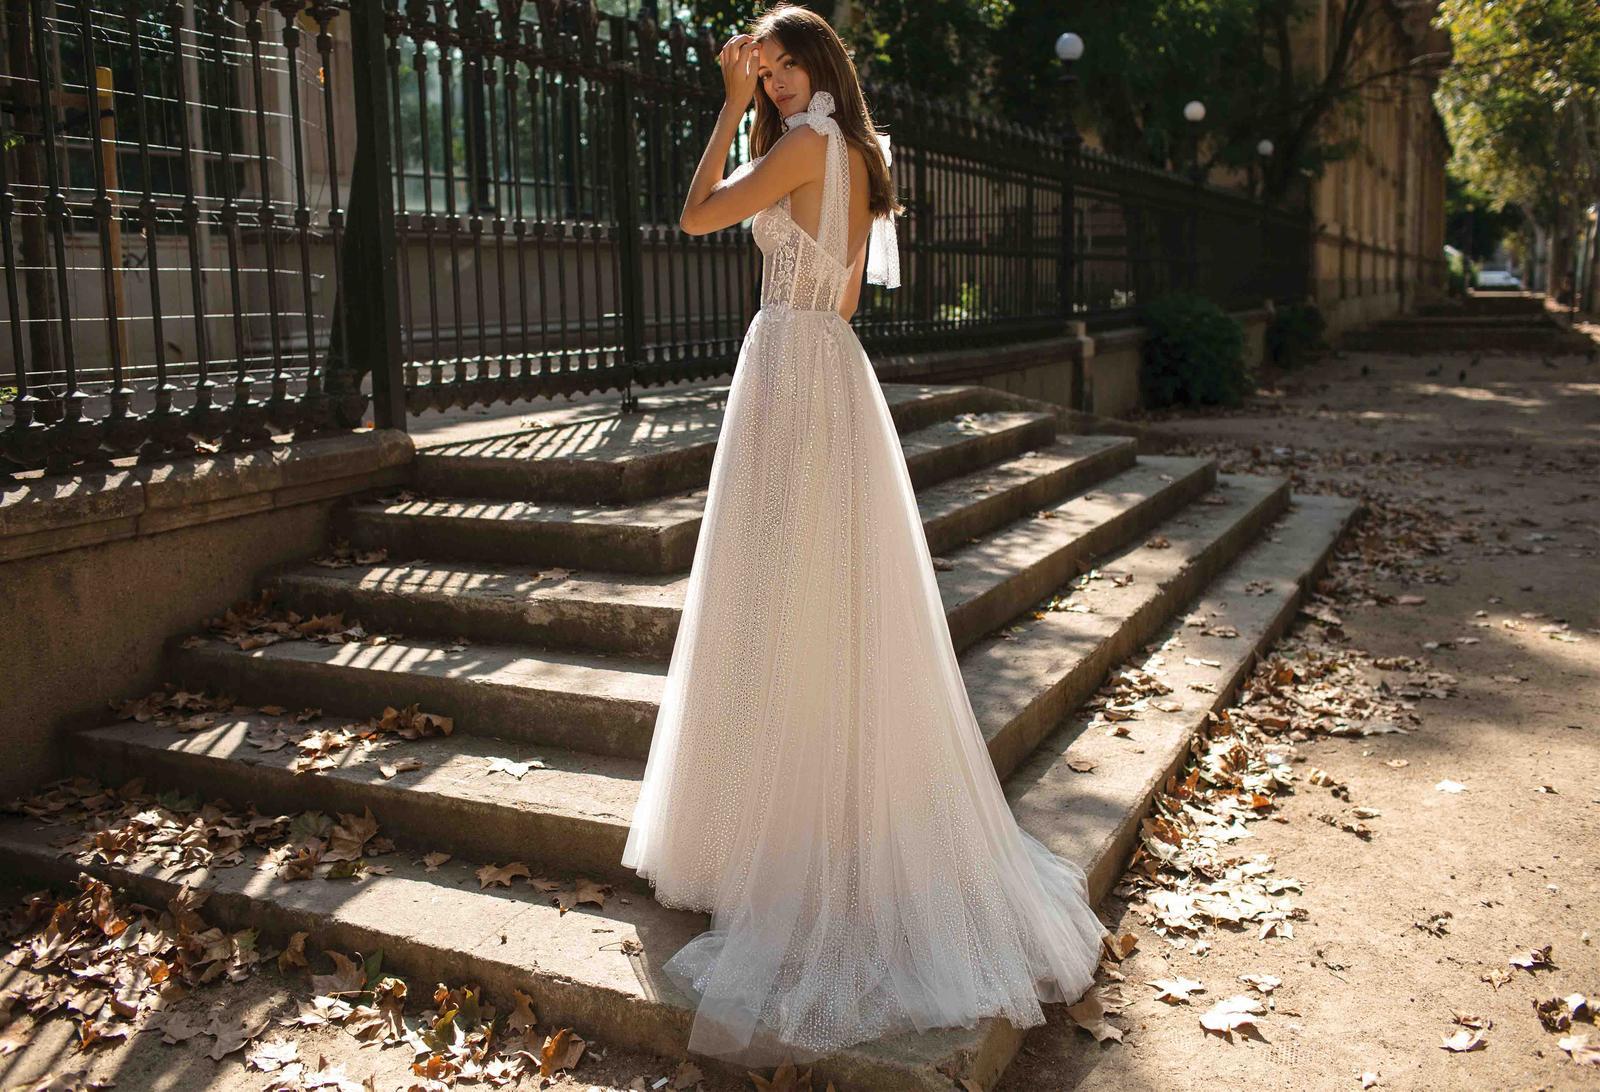 Muse by Berta * Svadobné šaty z kolekcií na rok 2019 - Obrázok č. 28